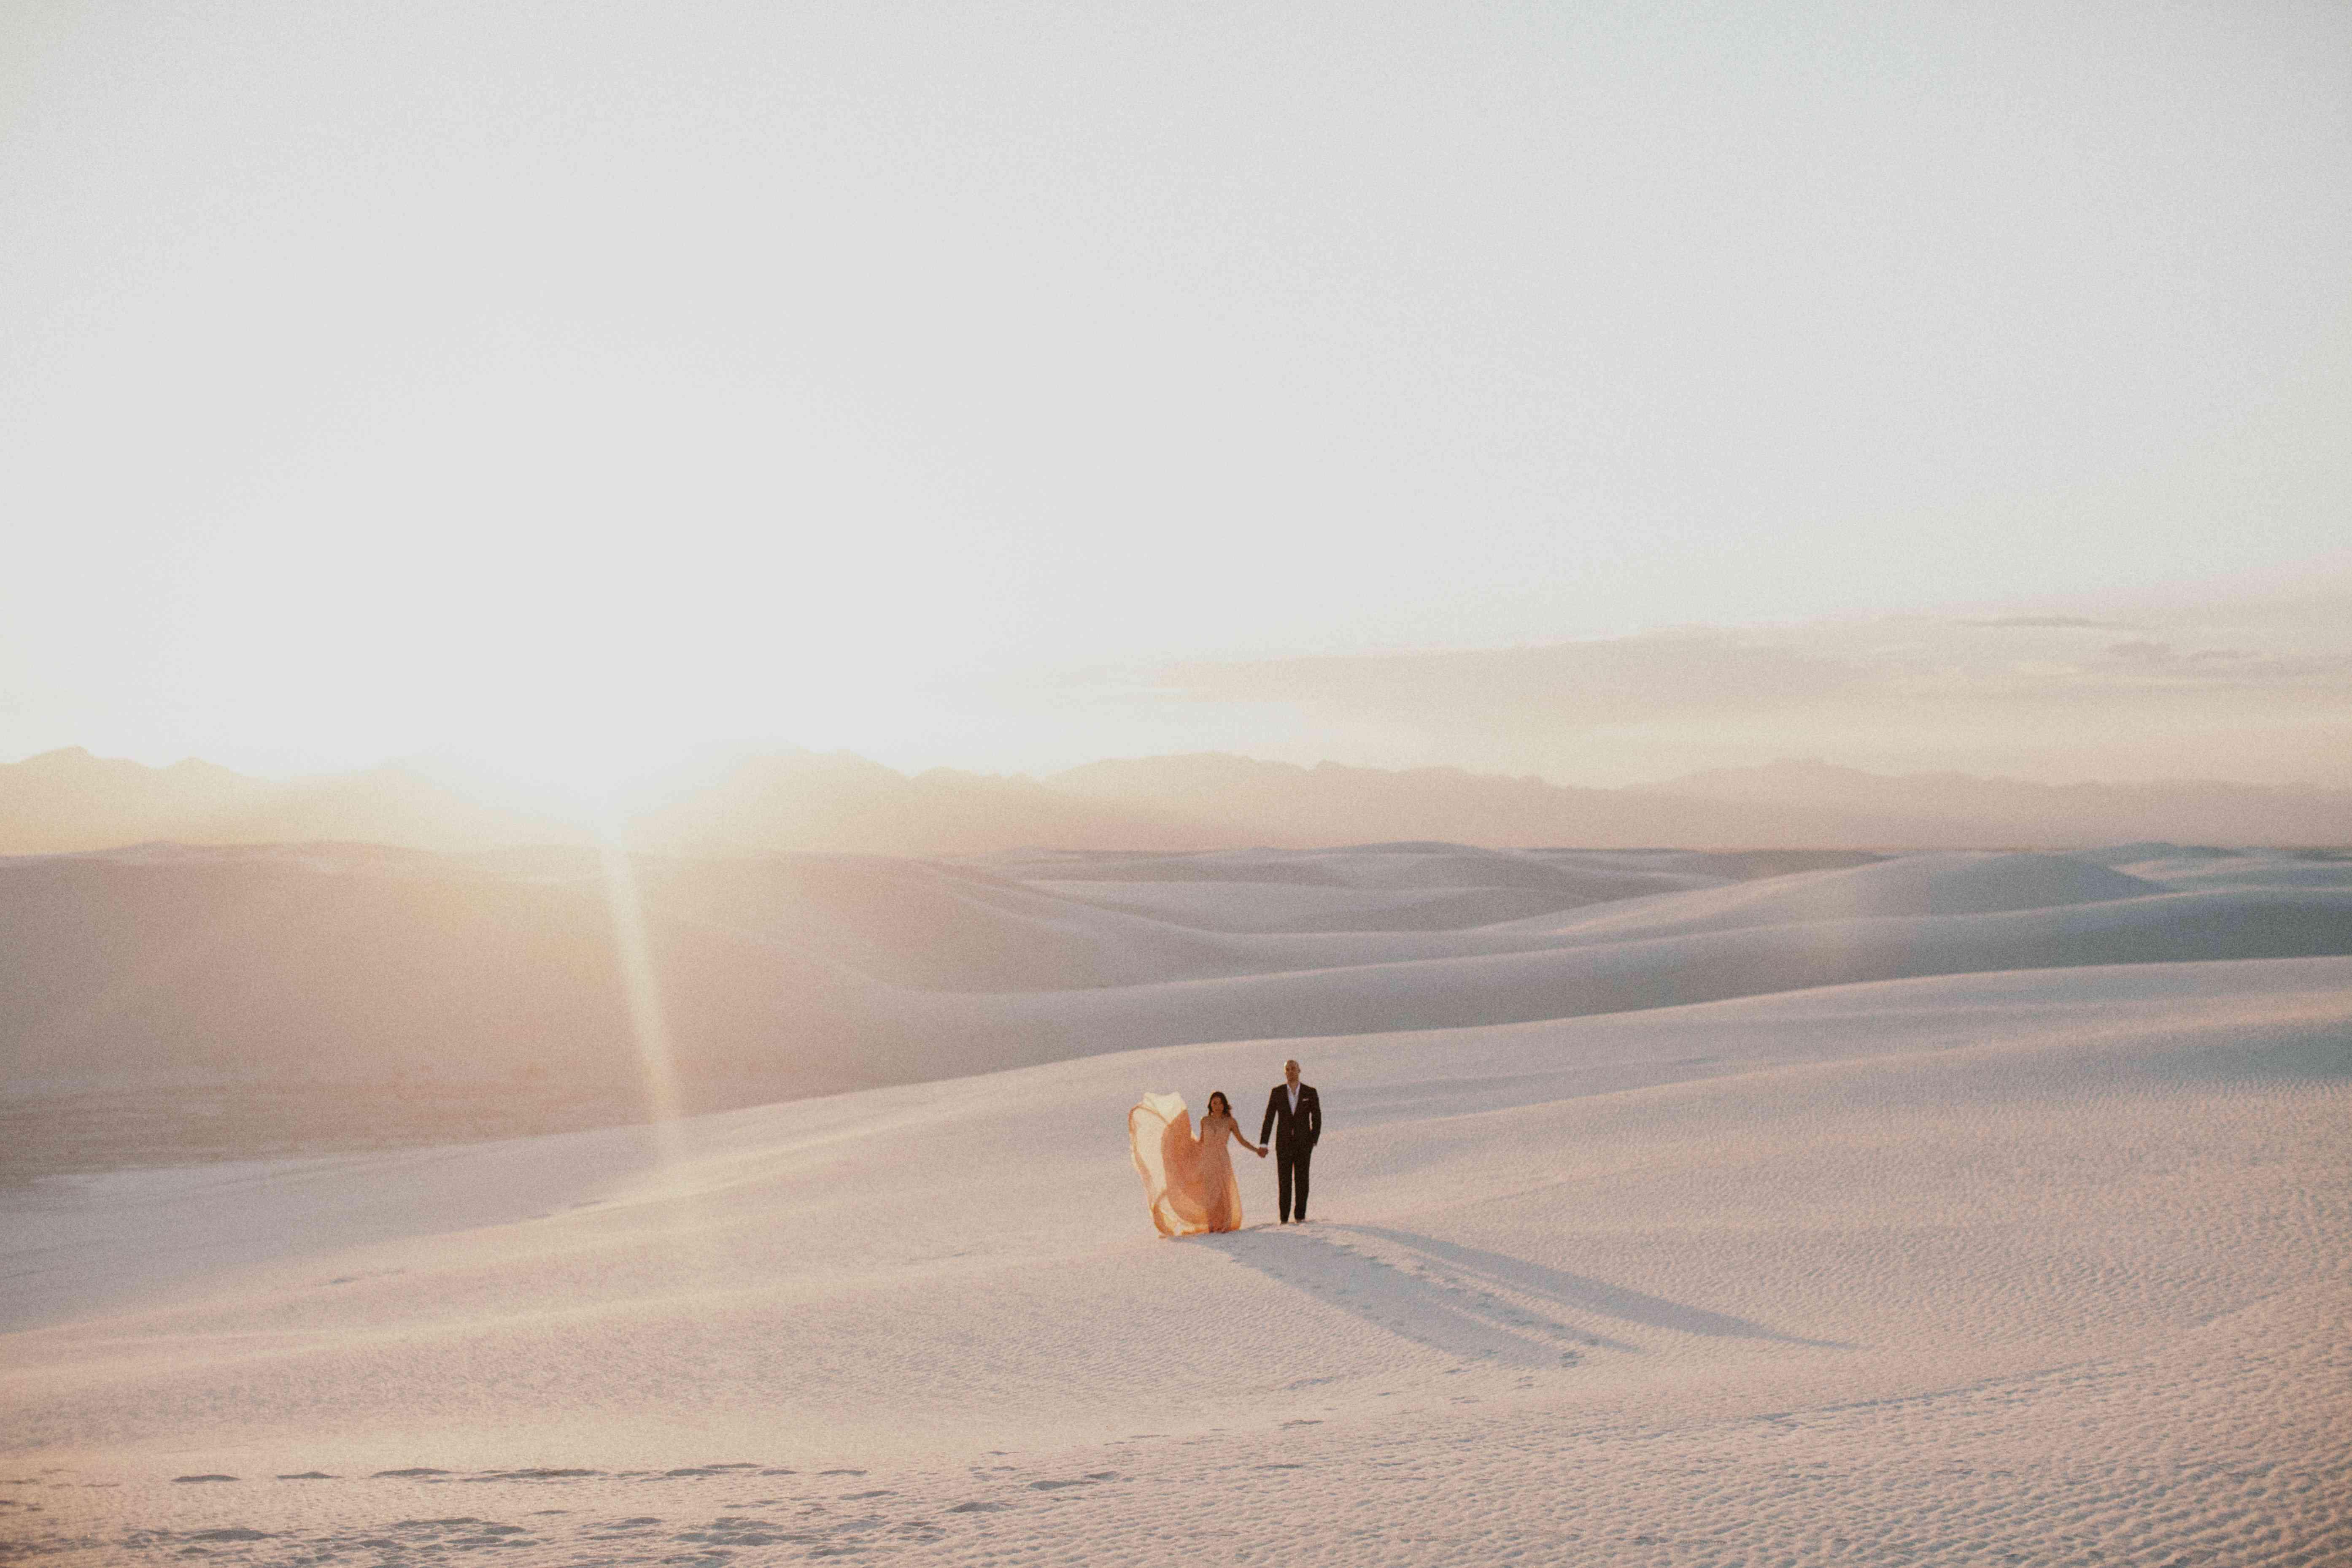 <p>Wedding photo in the Chihuahuan Desert</p>